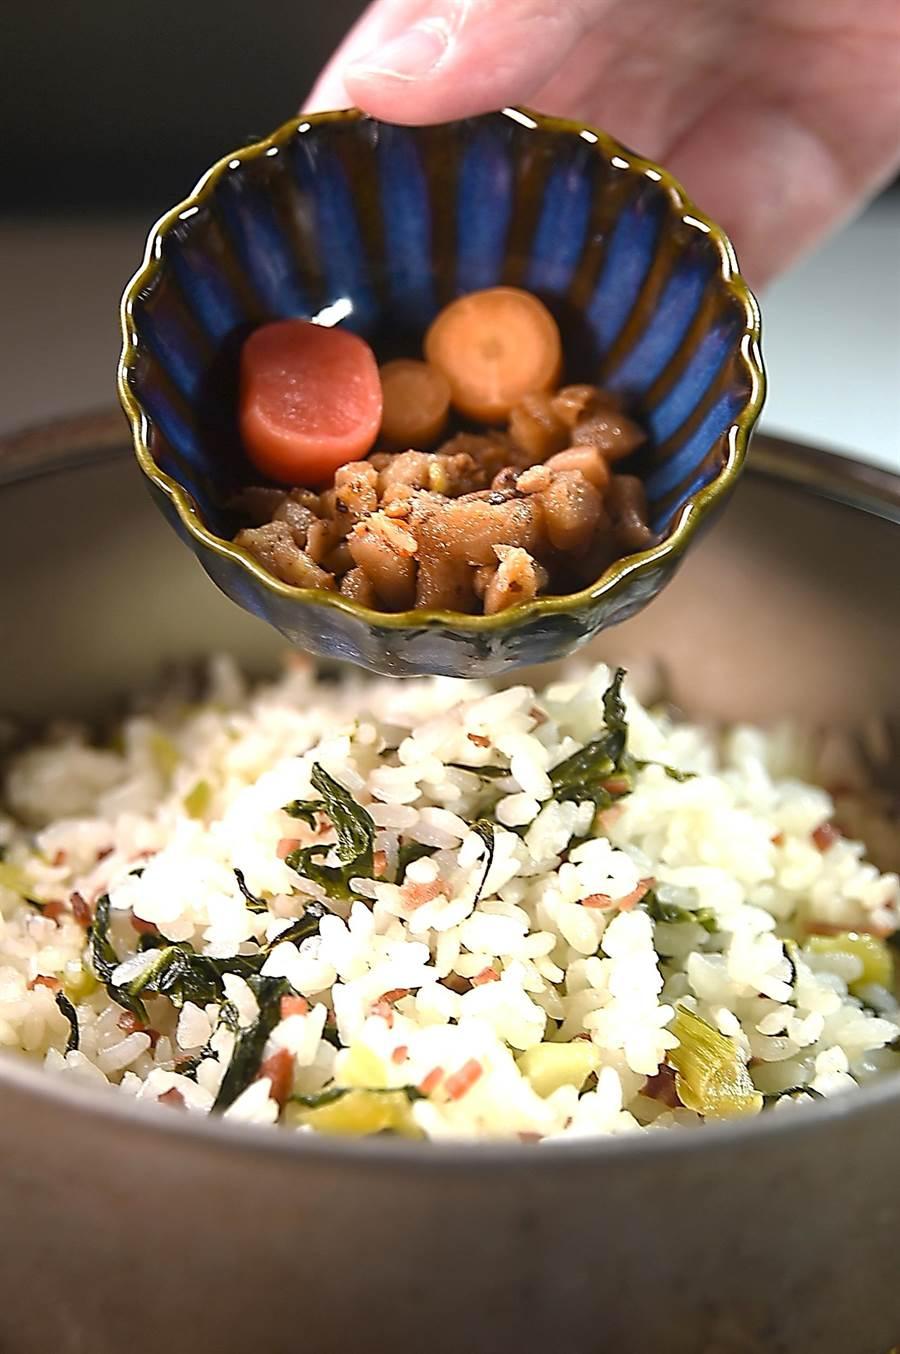 〈chinois〉的〈伊比利菜飯〉會附上主廚Vicent用小胡蘿蔔與櫻桃蘿蔔醃漬的漬菜。(圖/姚舜)